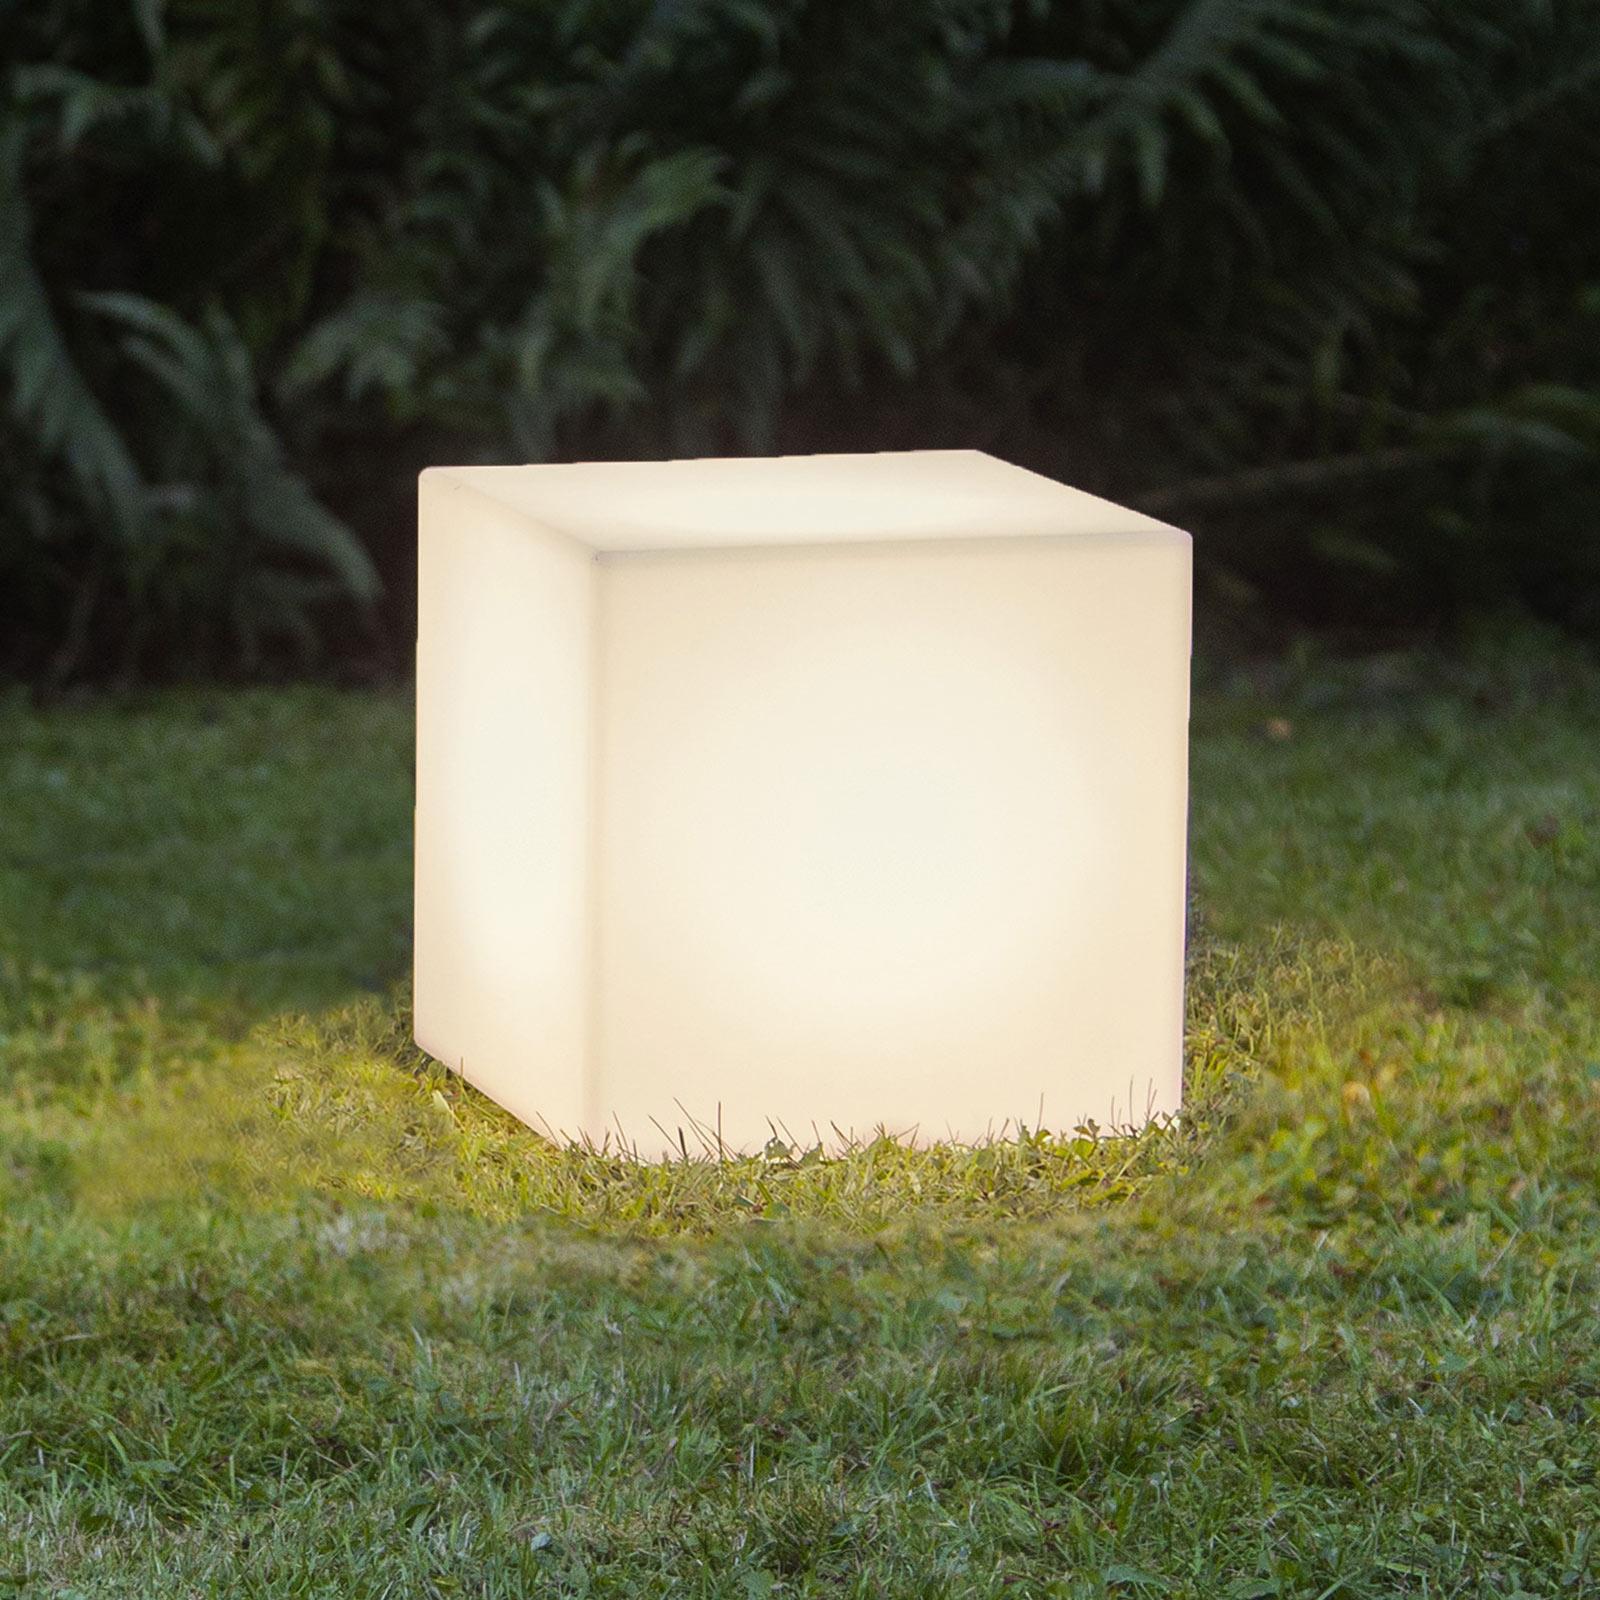 Lampa tarasowa Gardenlight, kostka, 30 cm